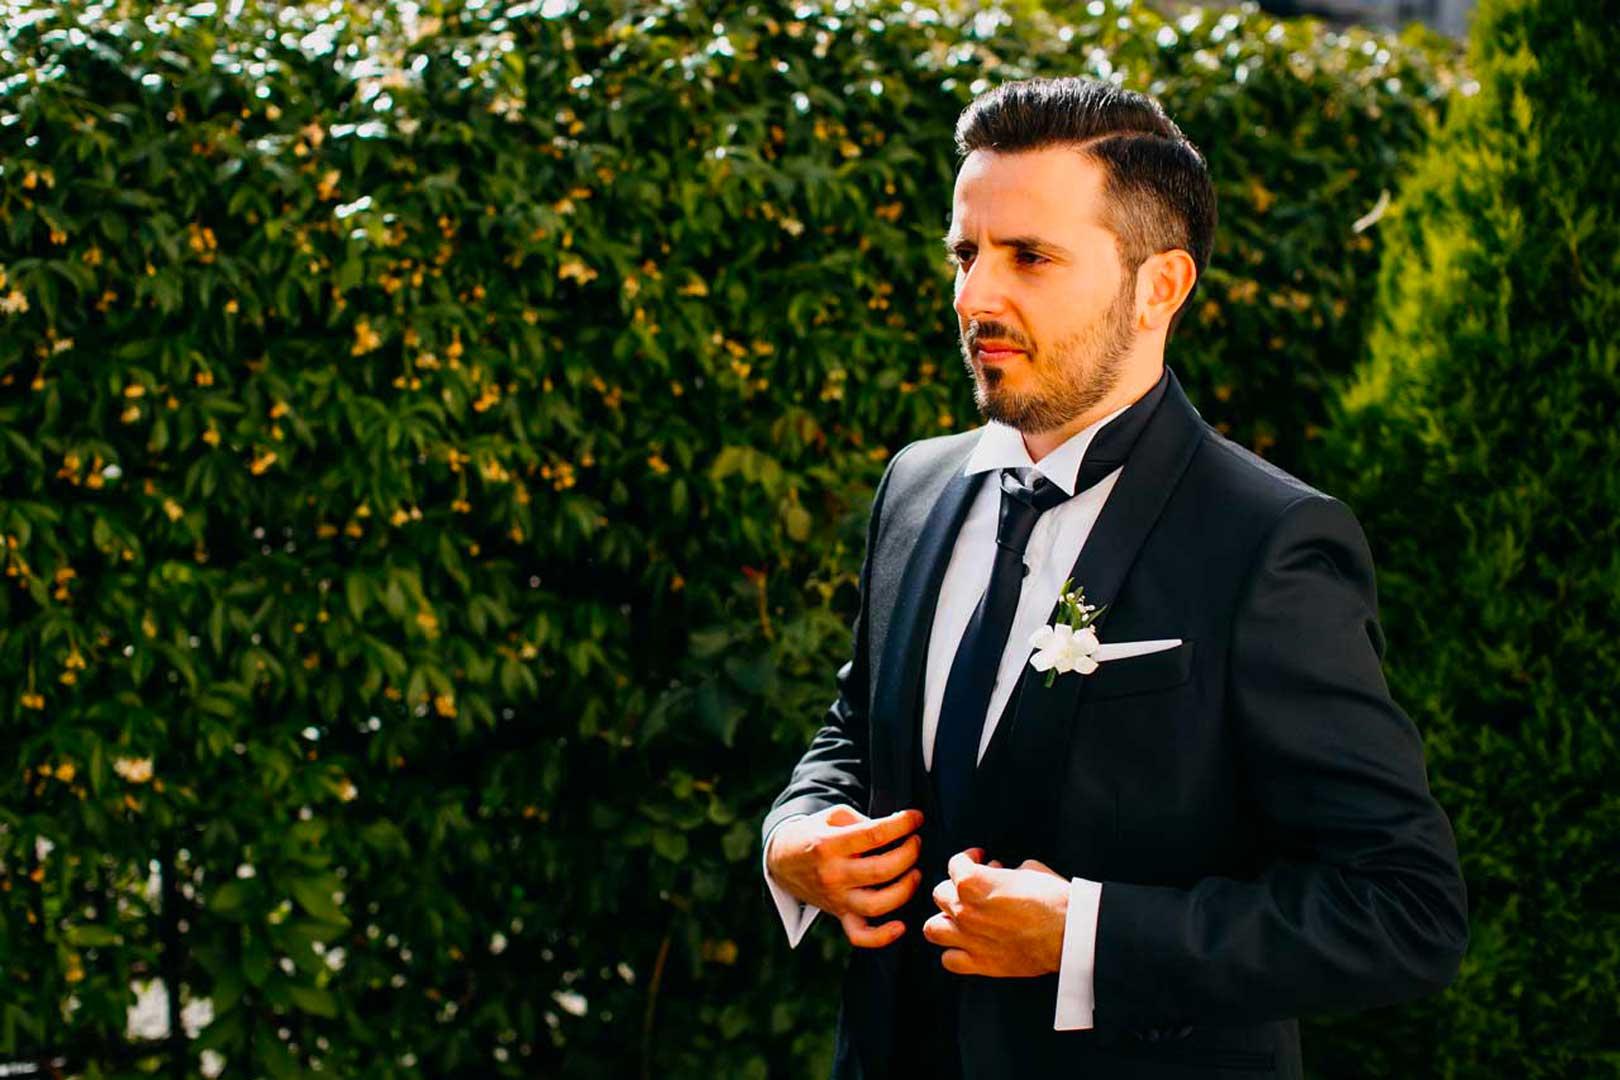 006-ritratto-sposo-gianni-lepore-wedding-photographer